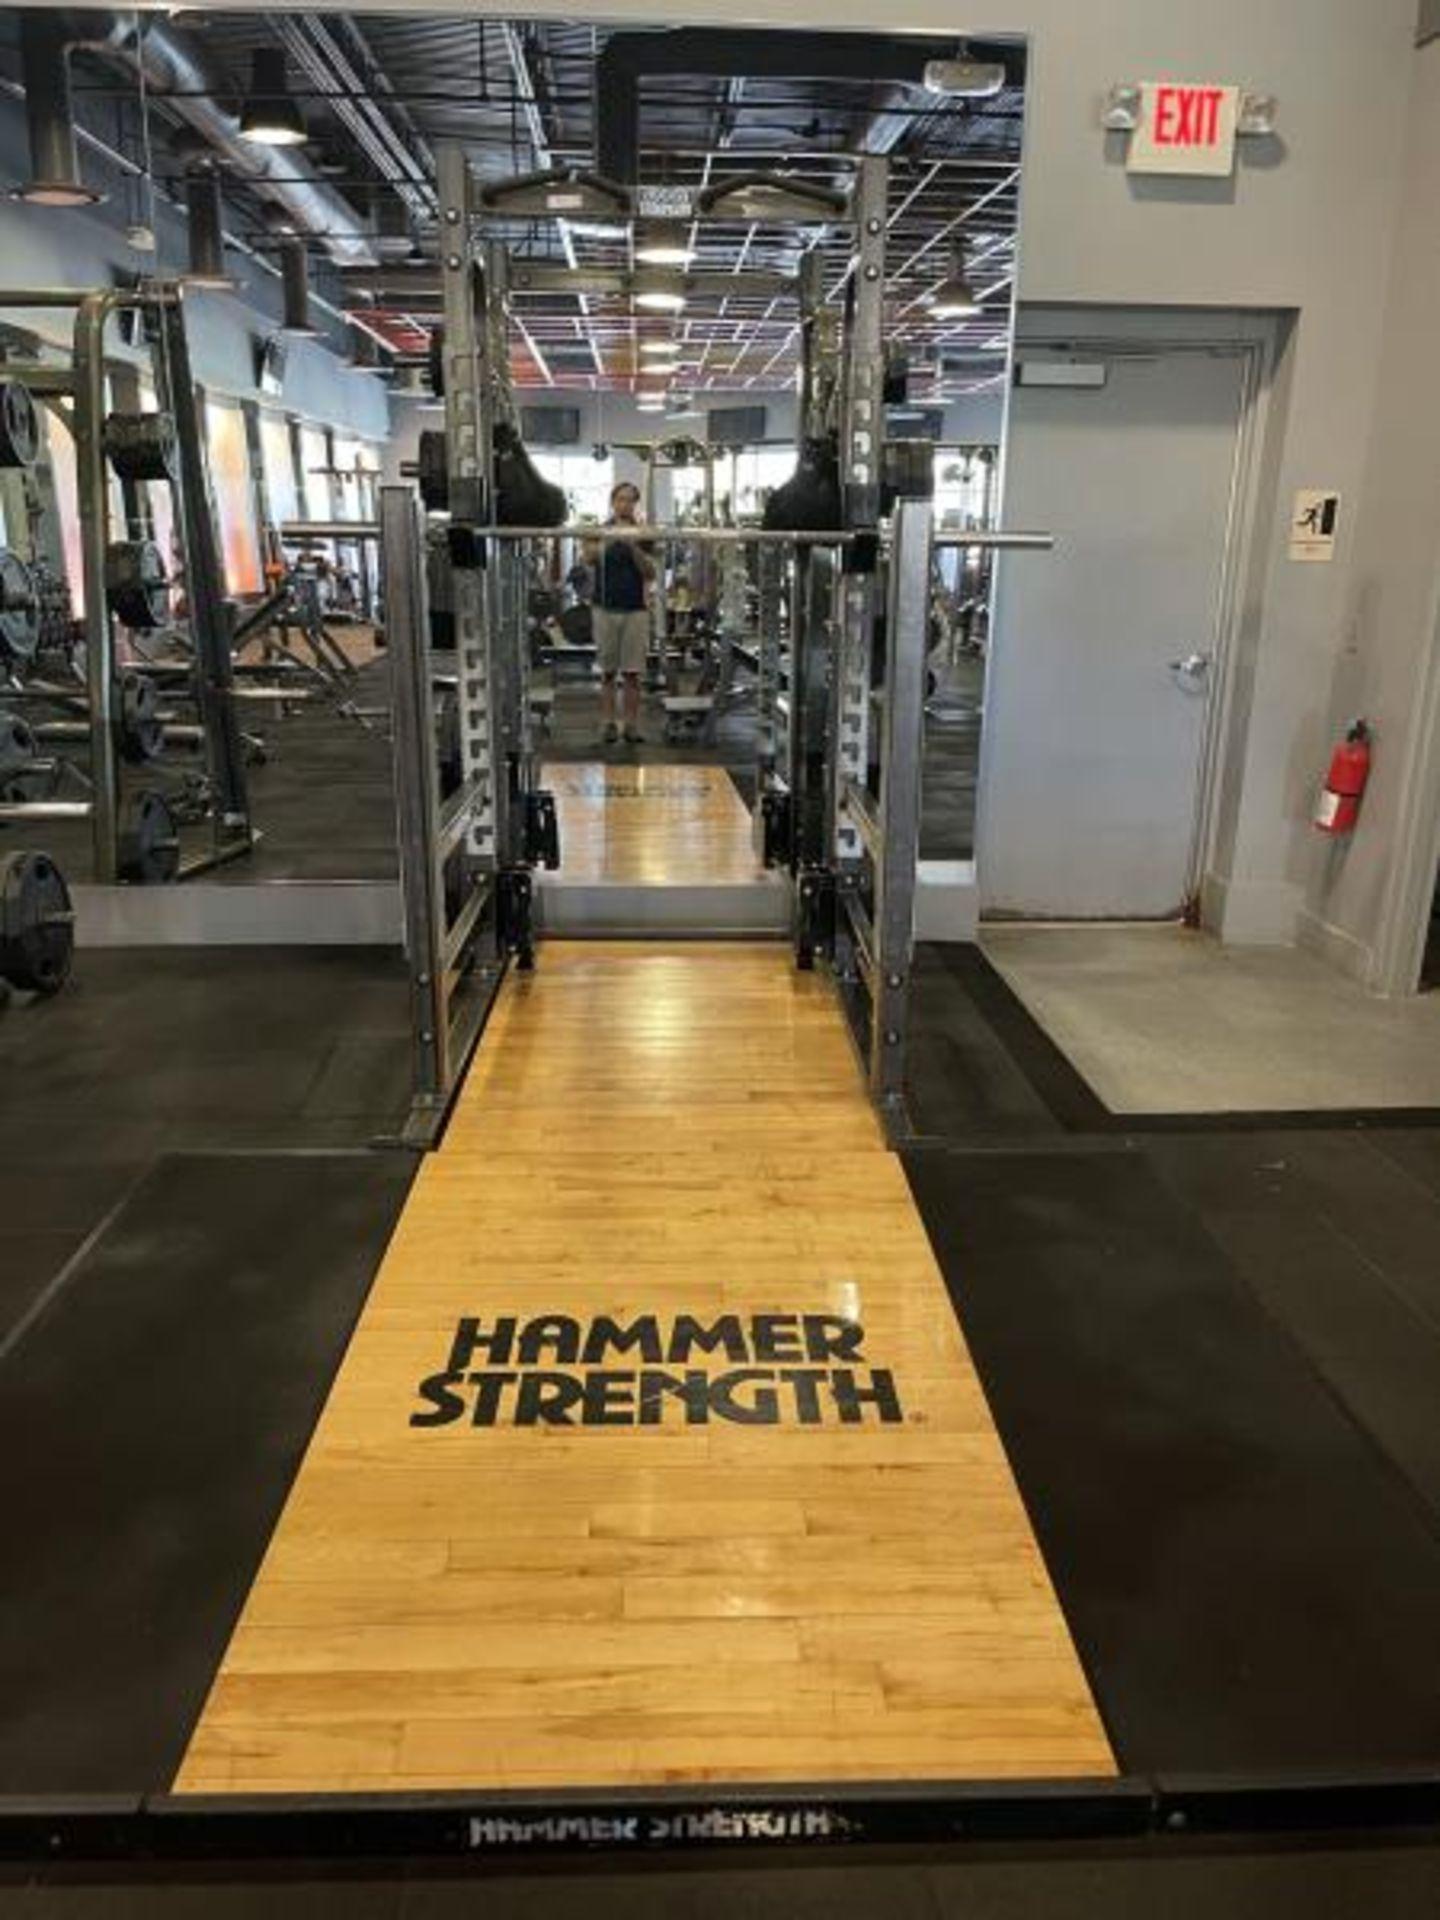 Hammer Strength with Wood Floor, Rack, Iron Grip Weight Plates M: HDMR8/B01